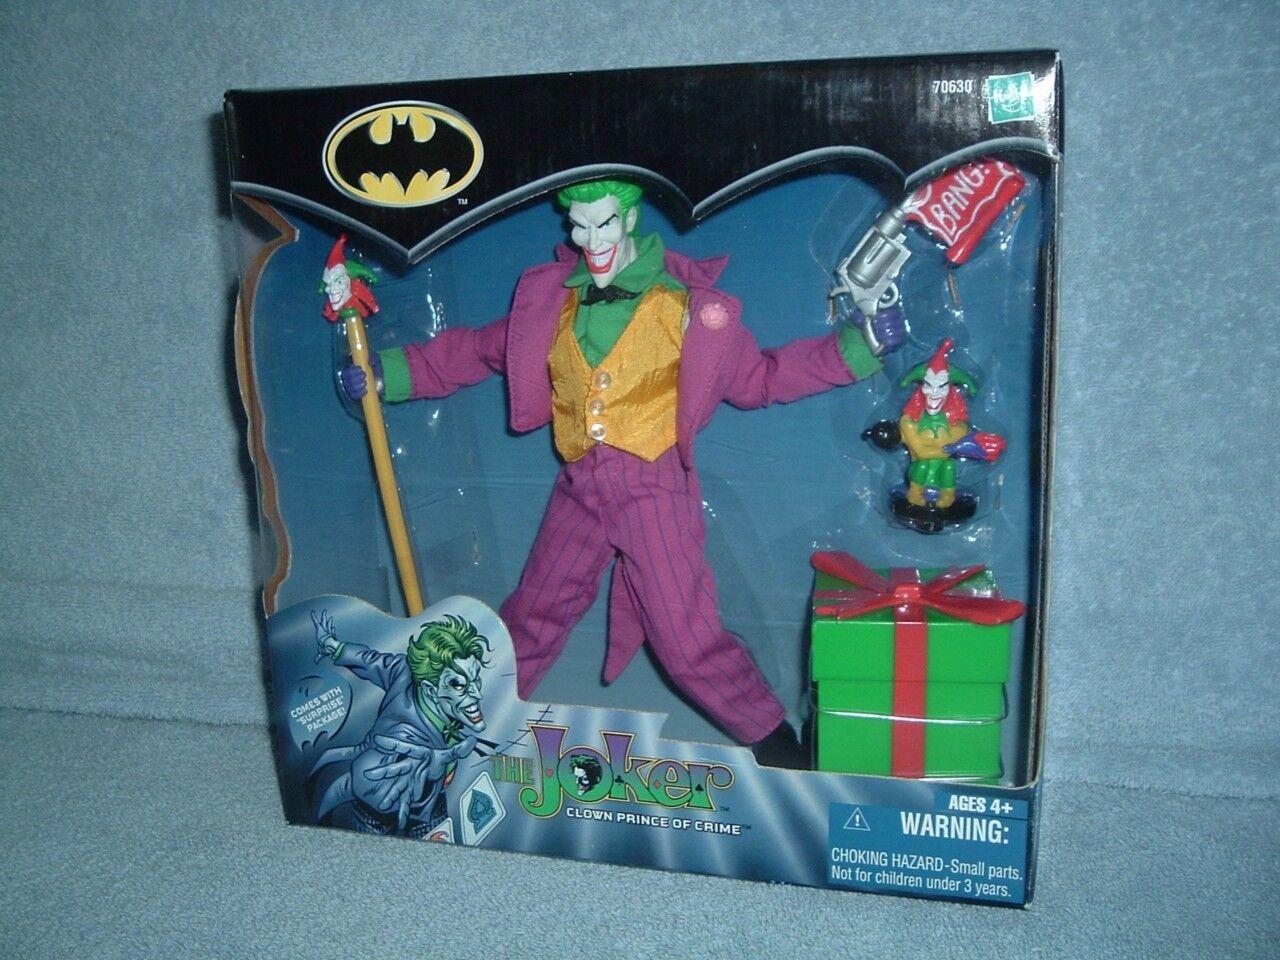 THE JOKER Clown Prince of Crime Hasbro 2001 Sealed MISB New Batman DC Comics